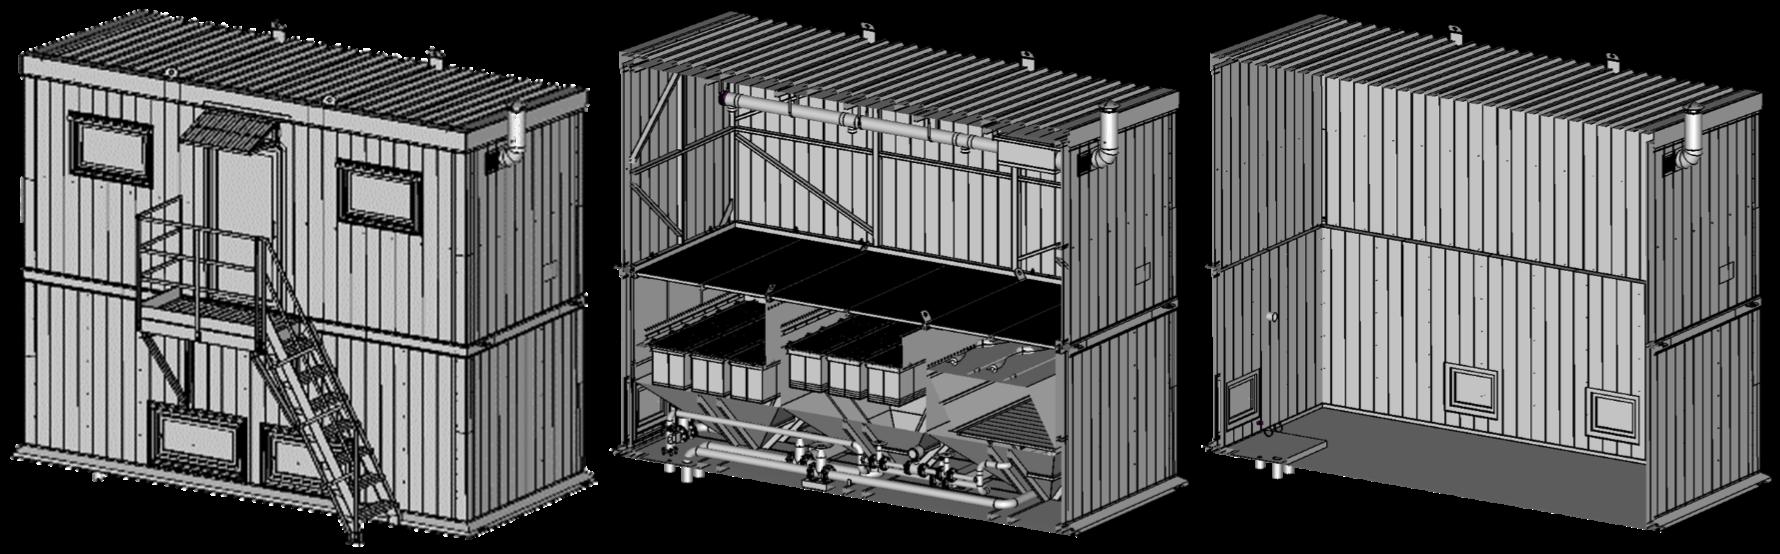 CADfix-container-Simplification.png